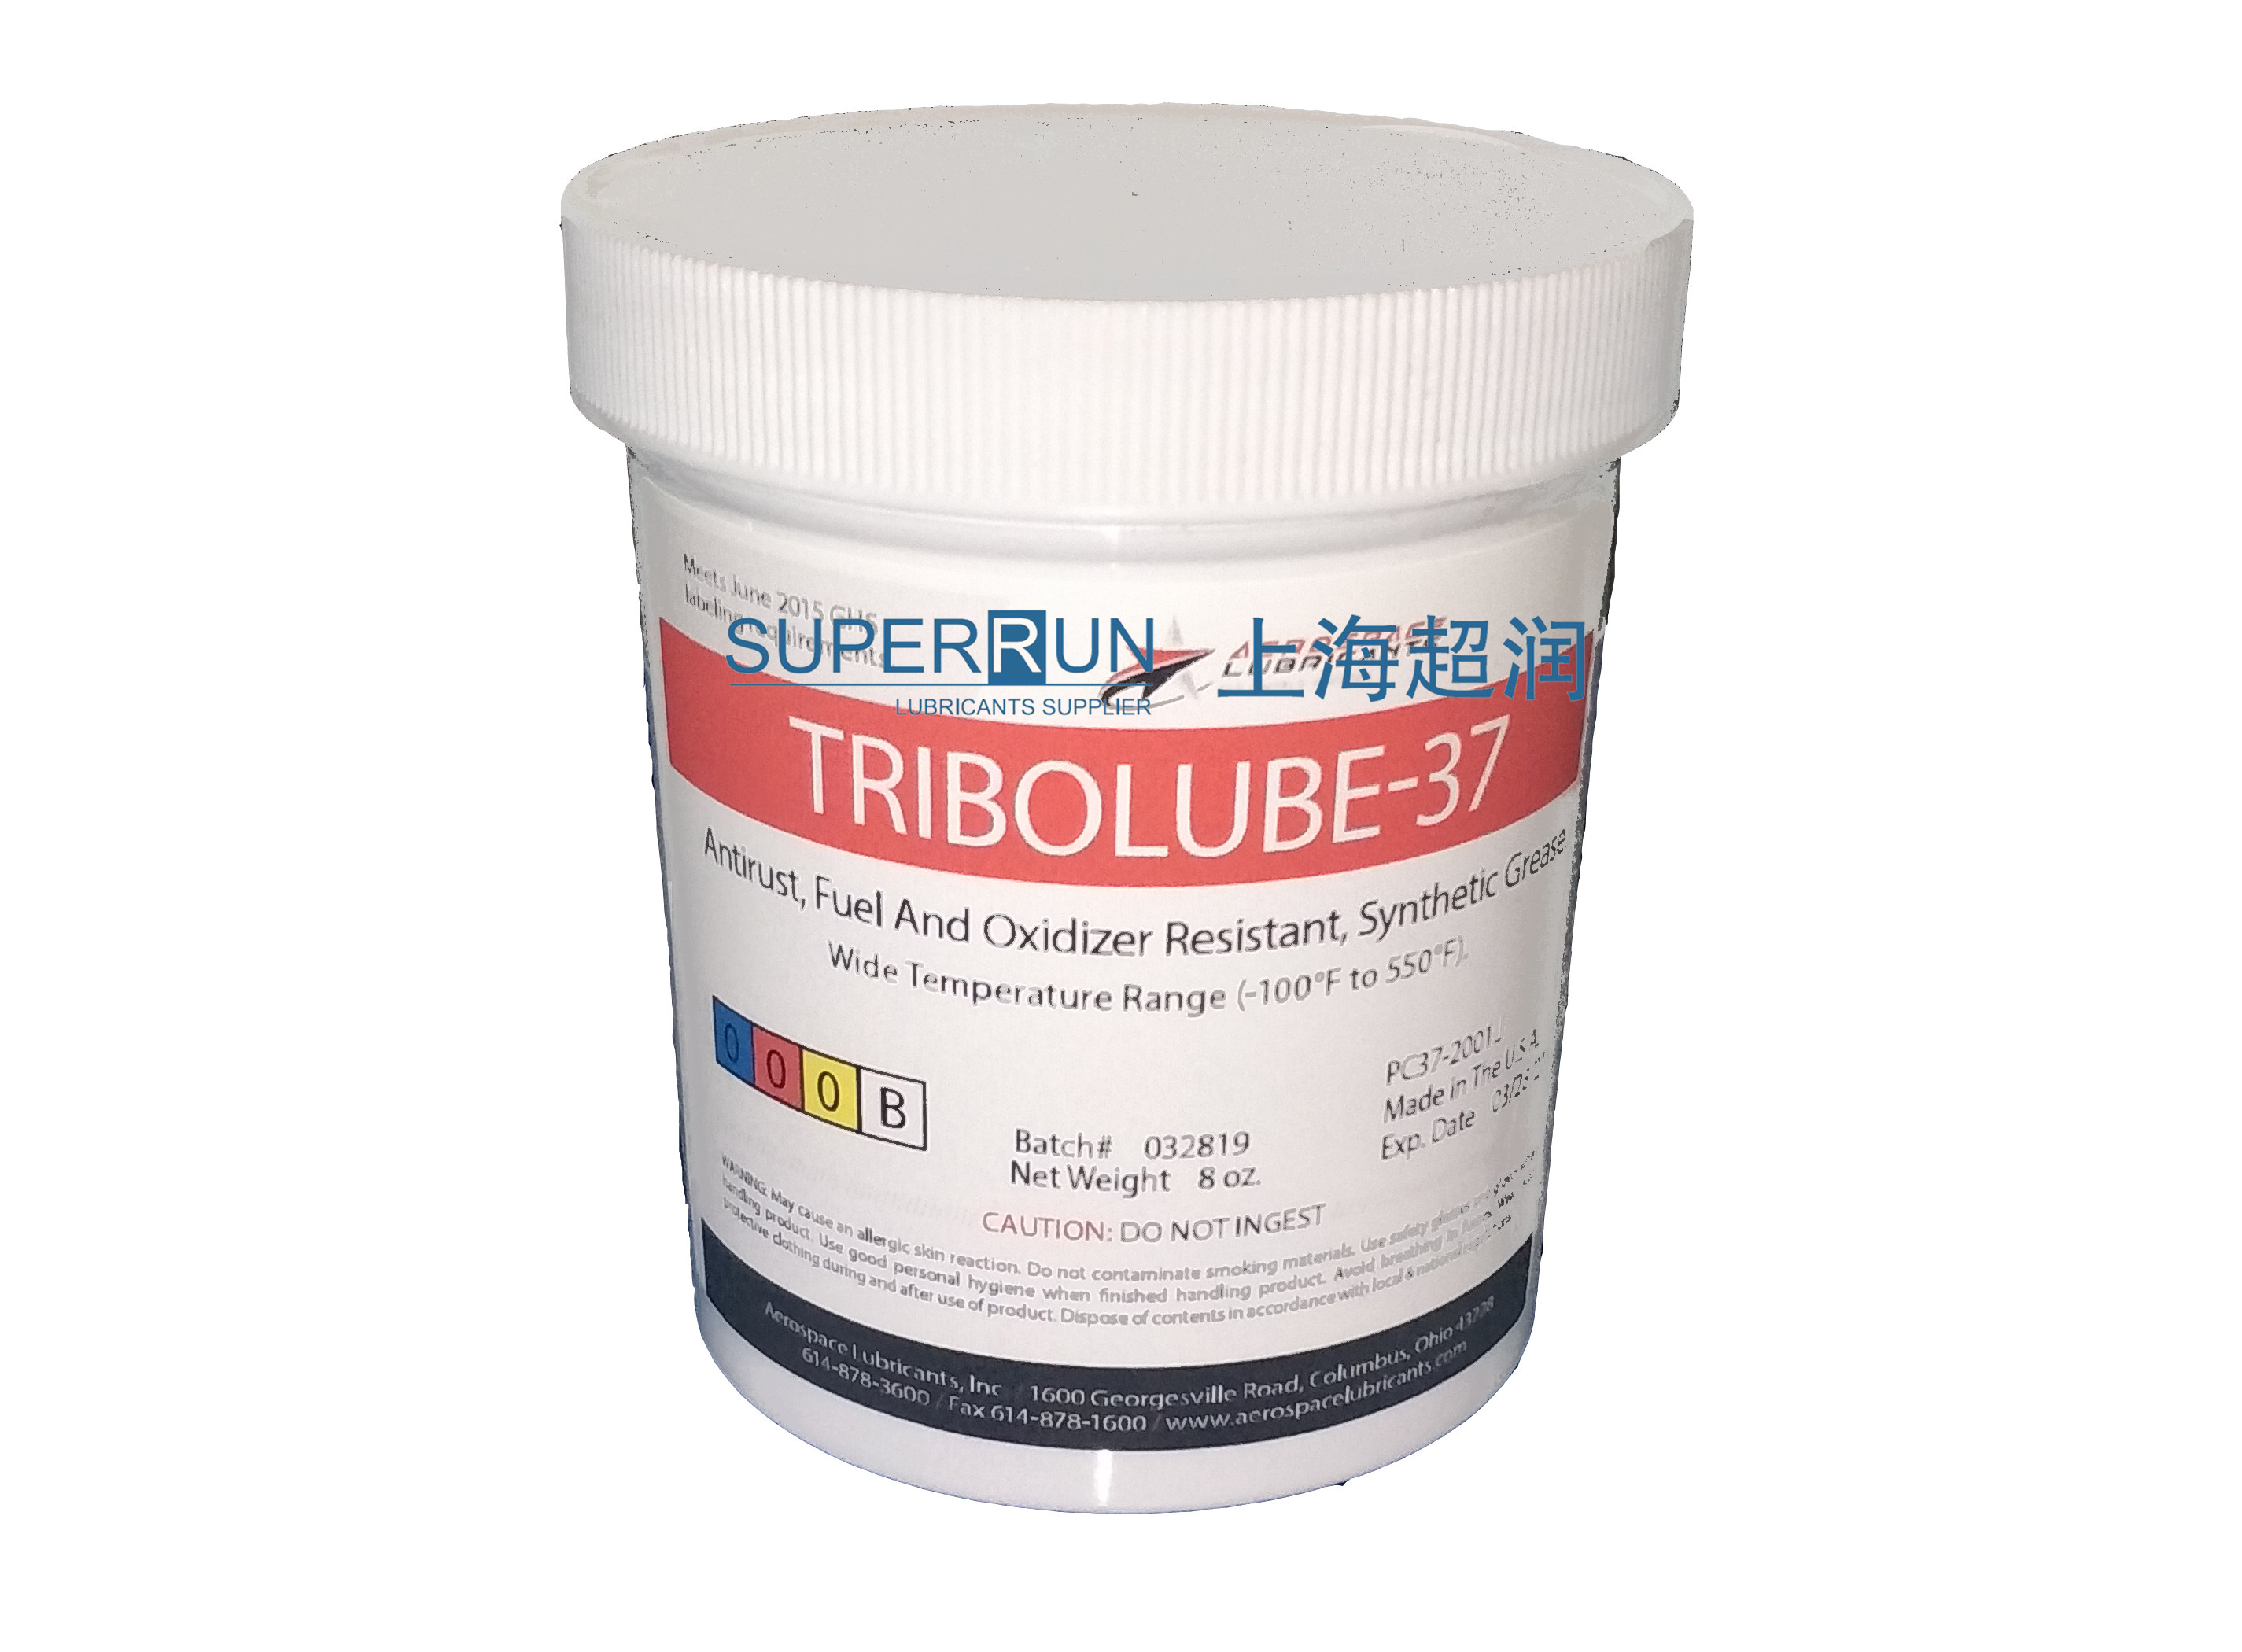 aerospace Tribolube 37